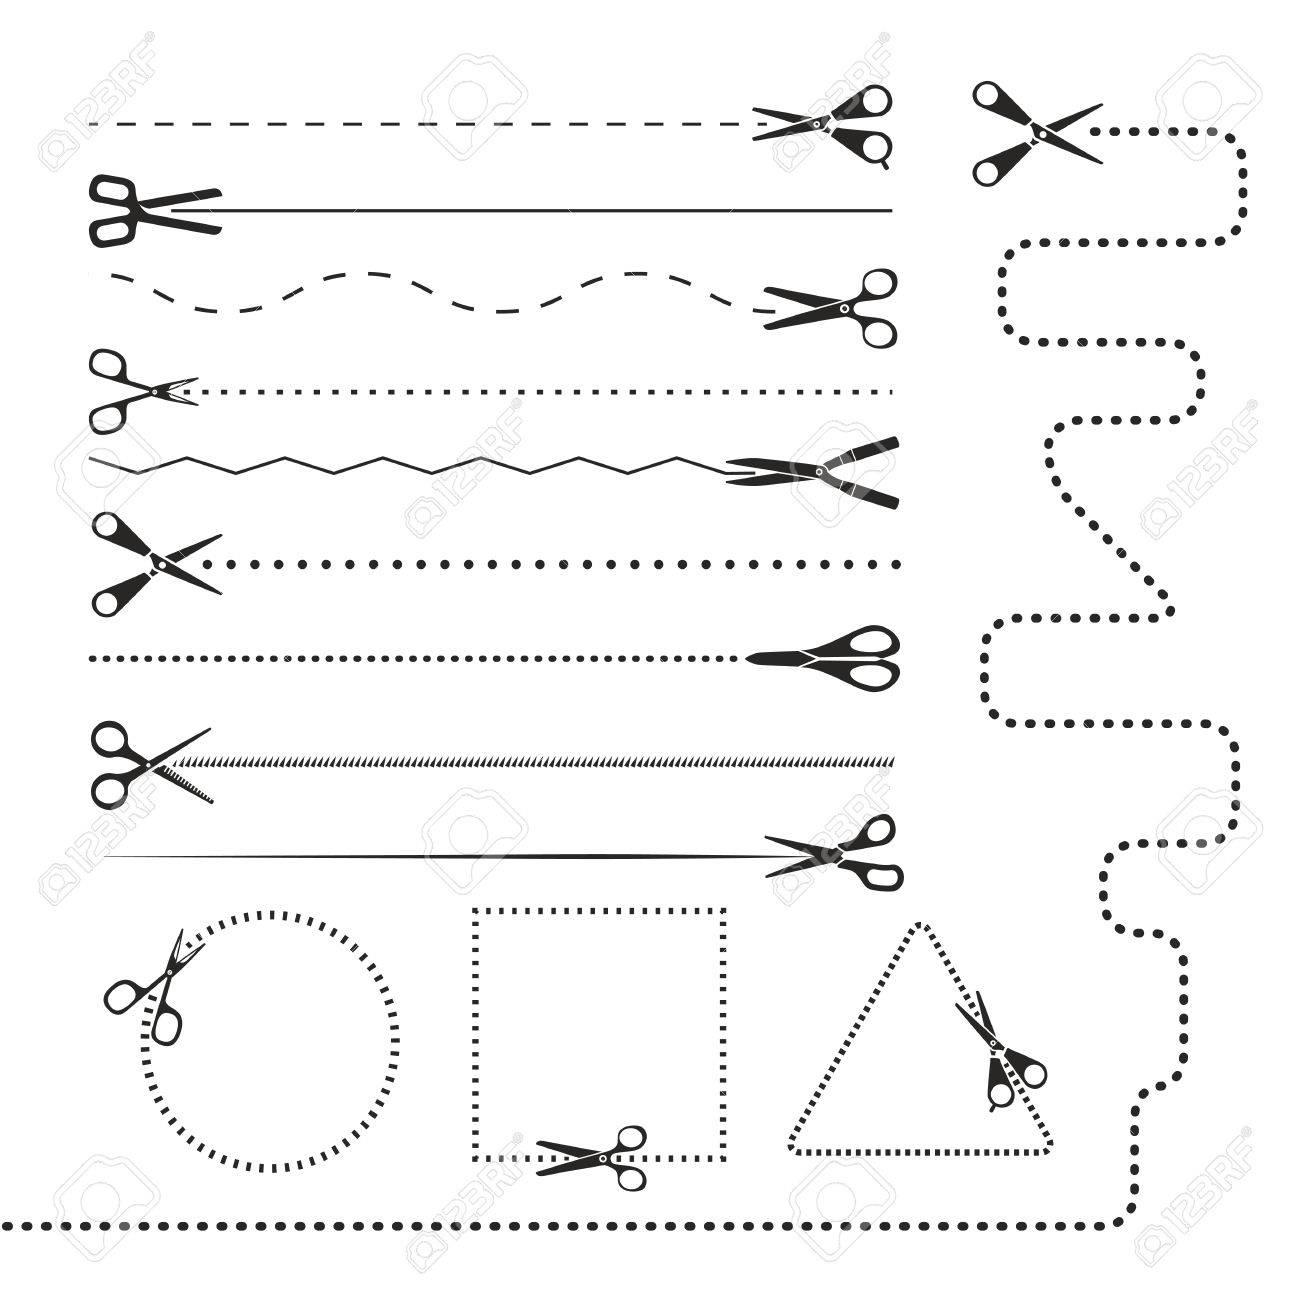 Scissors silhouettes dividers. Vector design elements - 23649134